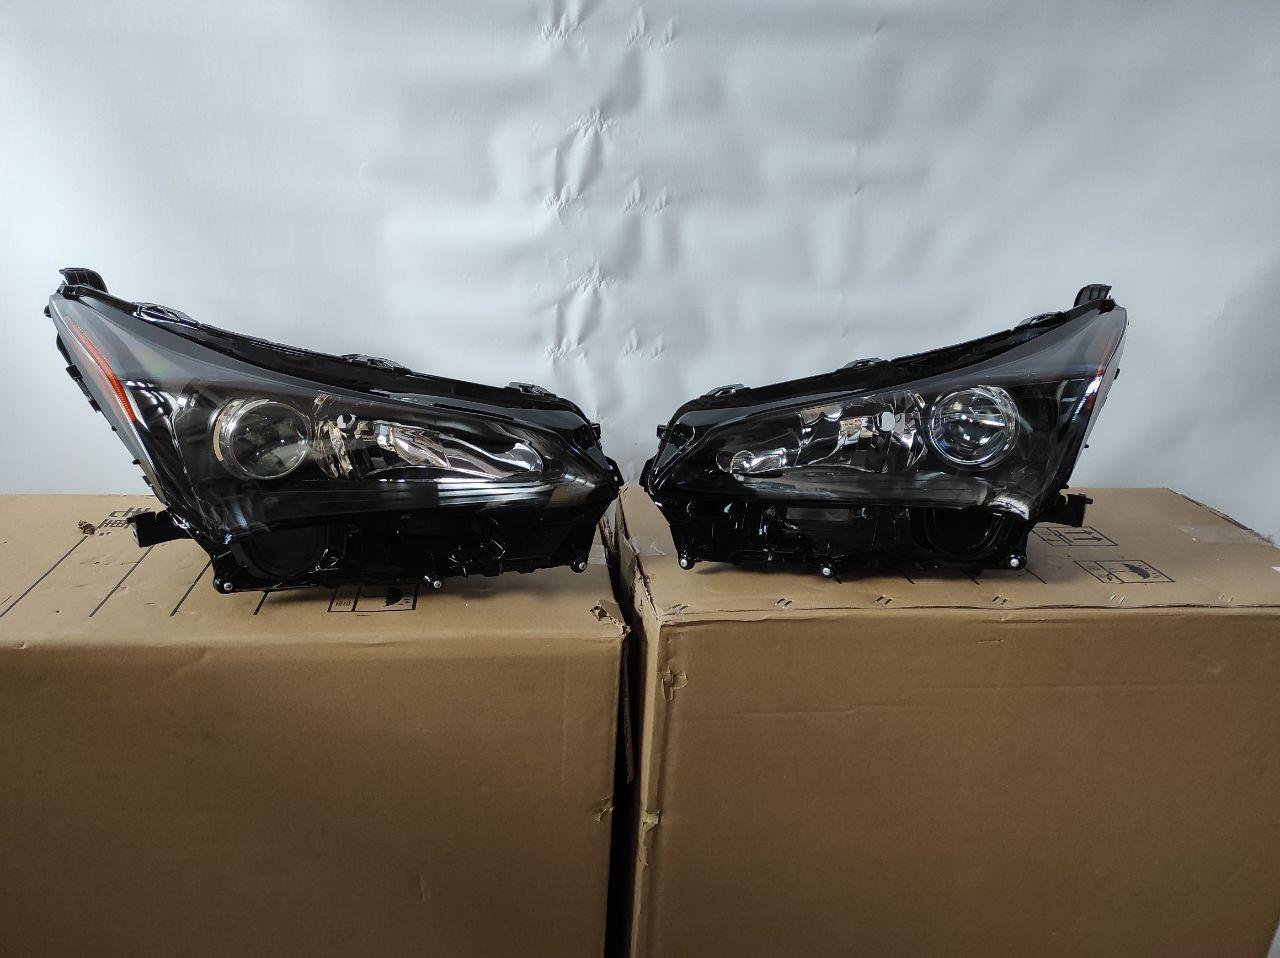 Lexus nx 200 2014-2020 фары бампер усилитель капот крылья  фара